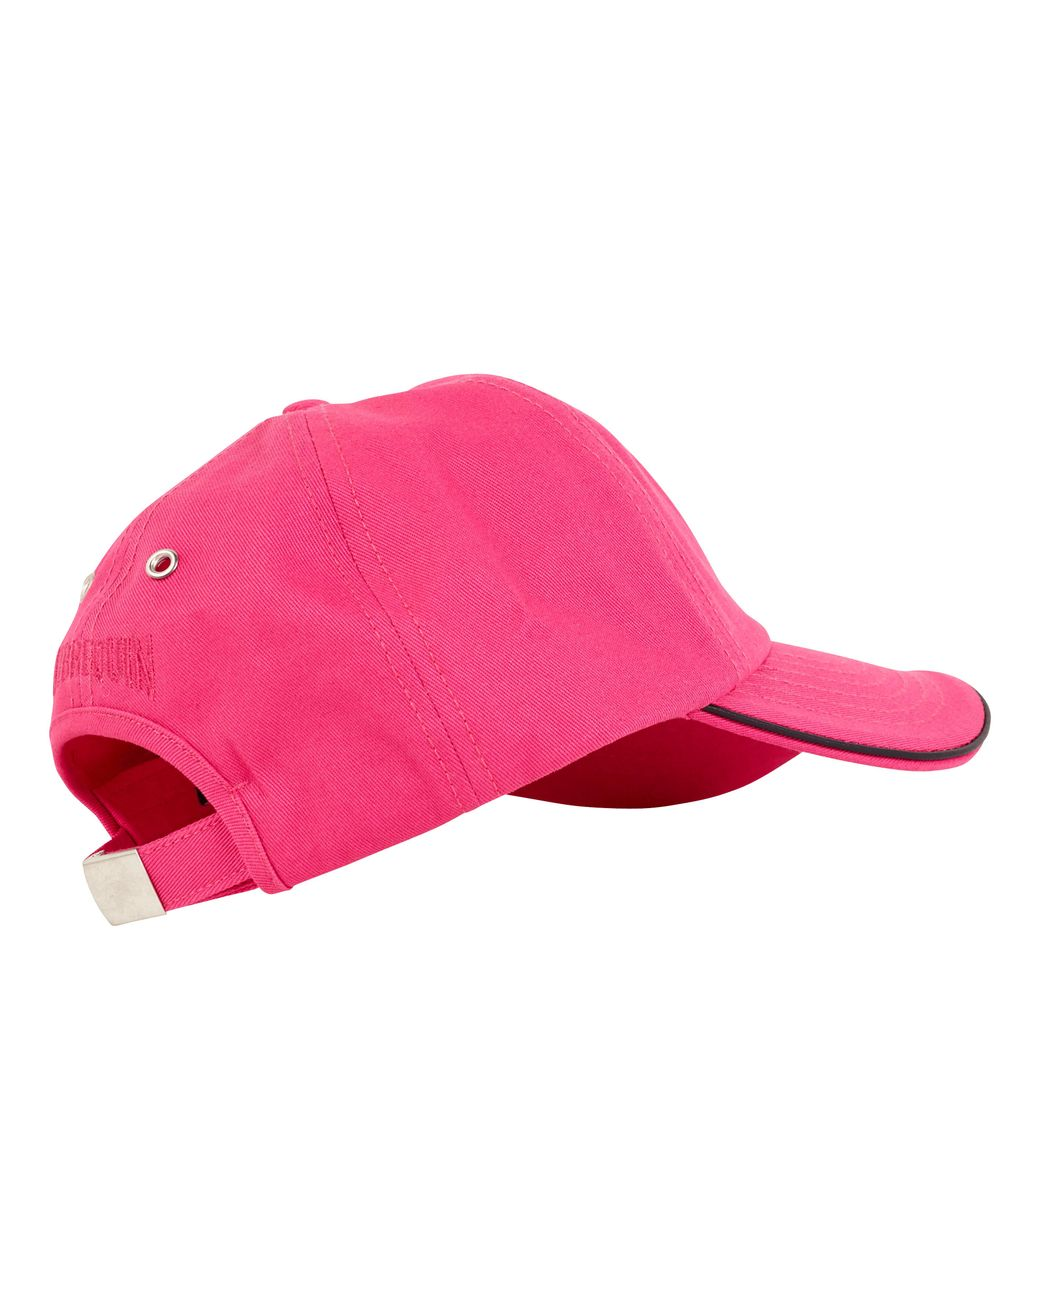 Black,Magenta,Blue,Grey Unisex//Mens//Womens One Size Striped Fila Beanie Hat